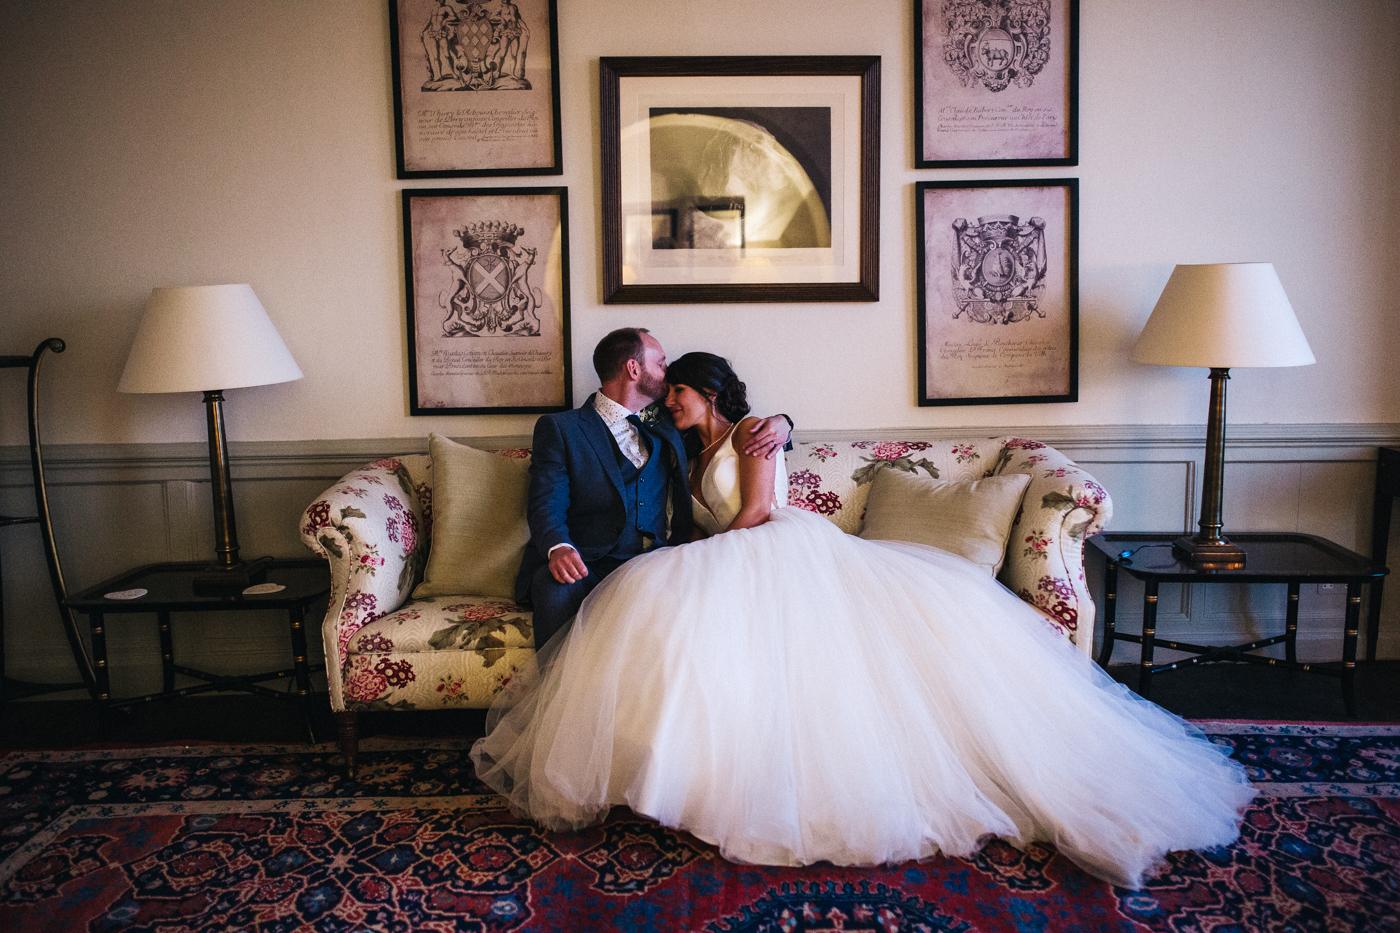 york-house-malton-wedding-photographer-north-yorkshire-0034.jpg